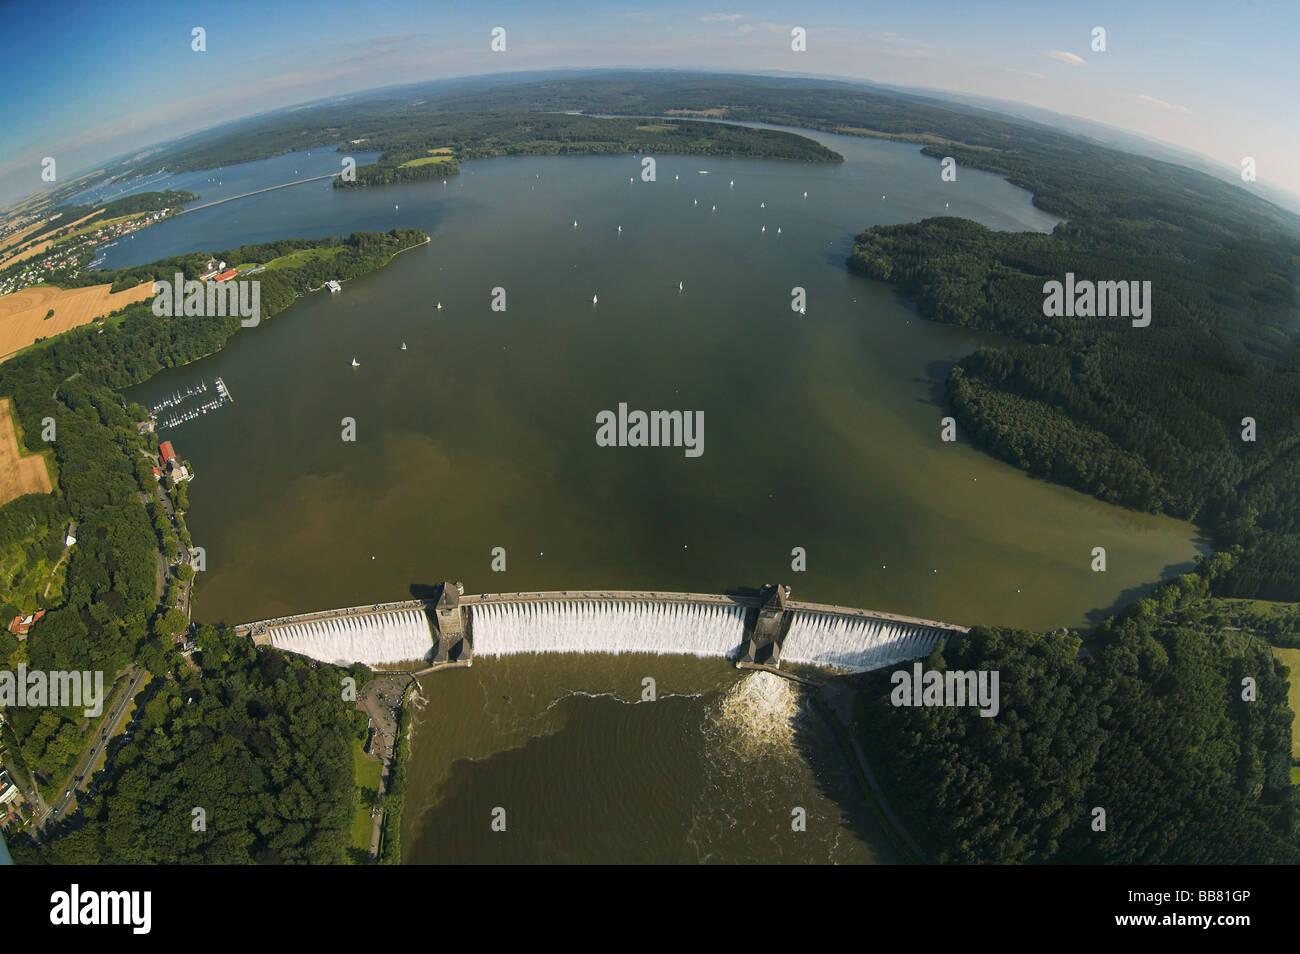 Aerial photo, Moehnesee, overflowing Moehne storage lake, retaining wall, Hochsauerlandkreis, Sauerland, North Rhine - Stock Image